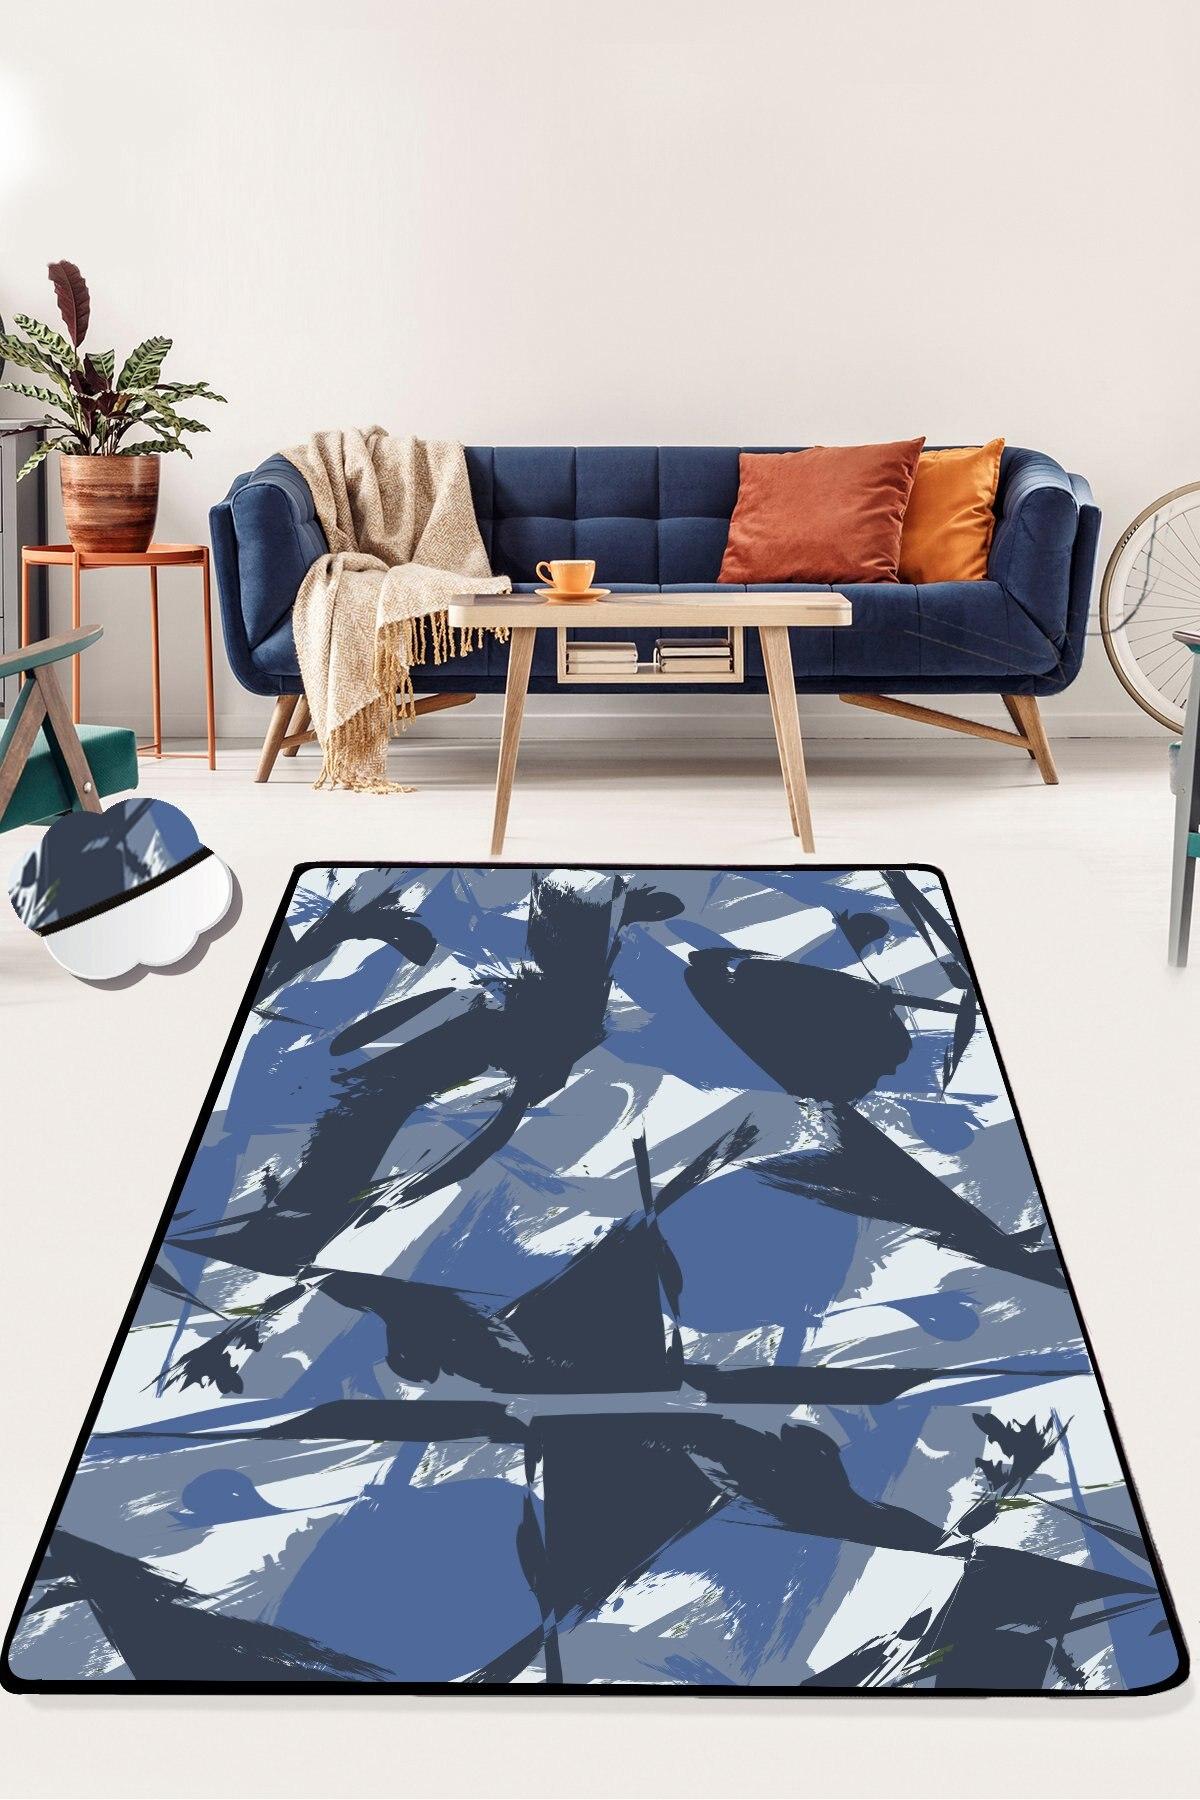 Etgديكور مجردة الأزرق نموذج 100x300 سم 40 ''x 118'' بوصة ديكور عدم الانزلاق منطقة البساط